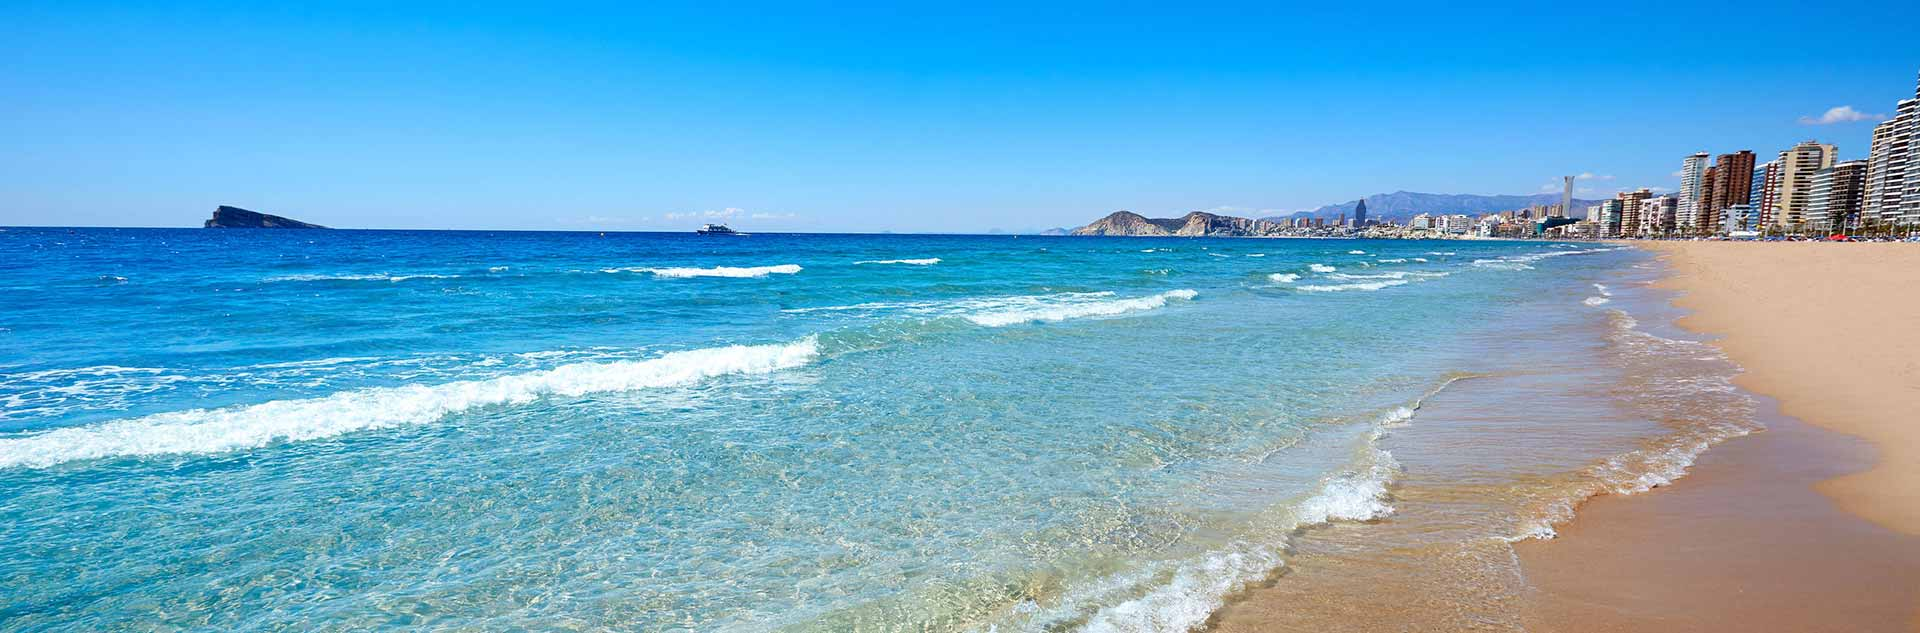 Playa de Levante de Benidorm en Alicante mediterránea de España